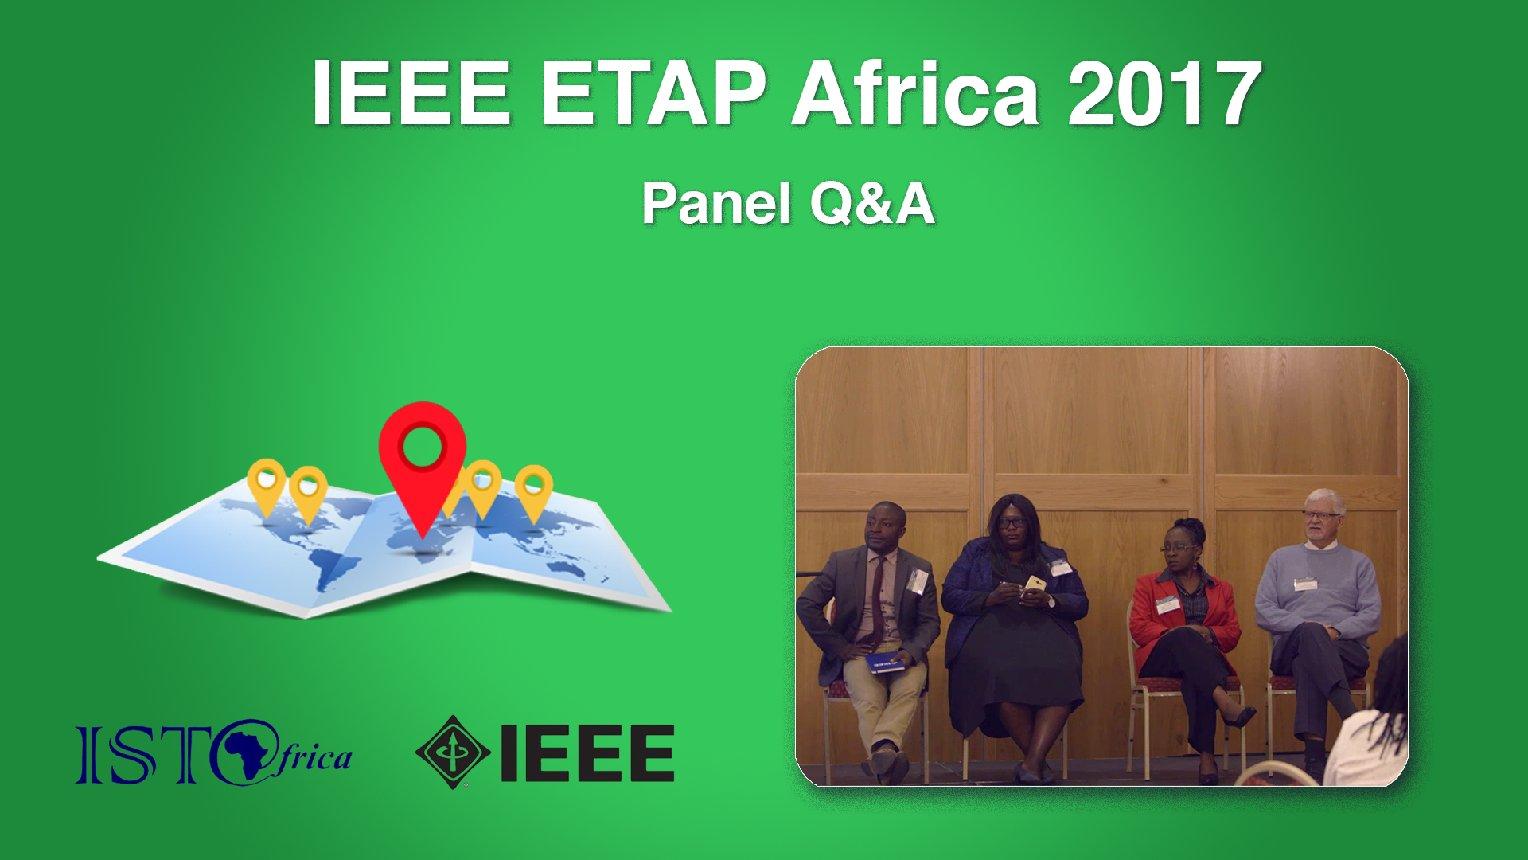 Panel Q&A - ETAP Forum Namibia, Africa 2017